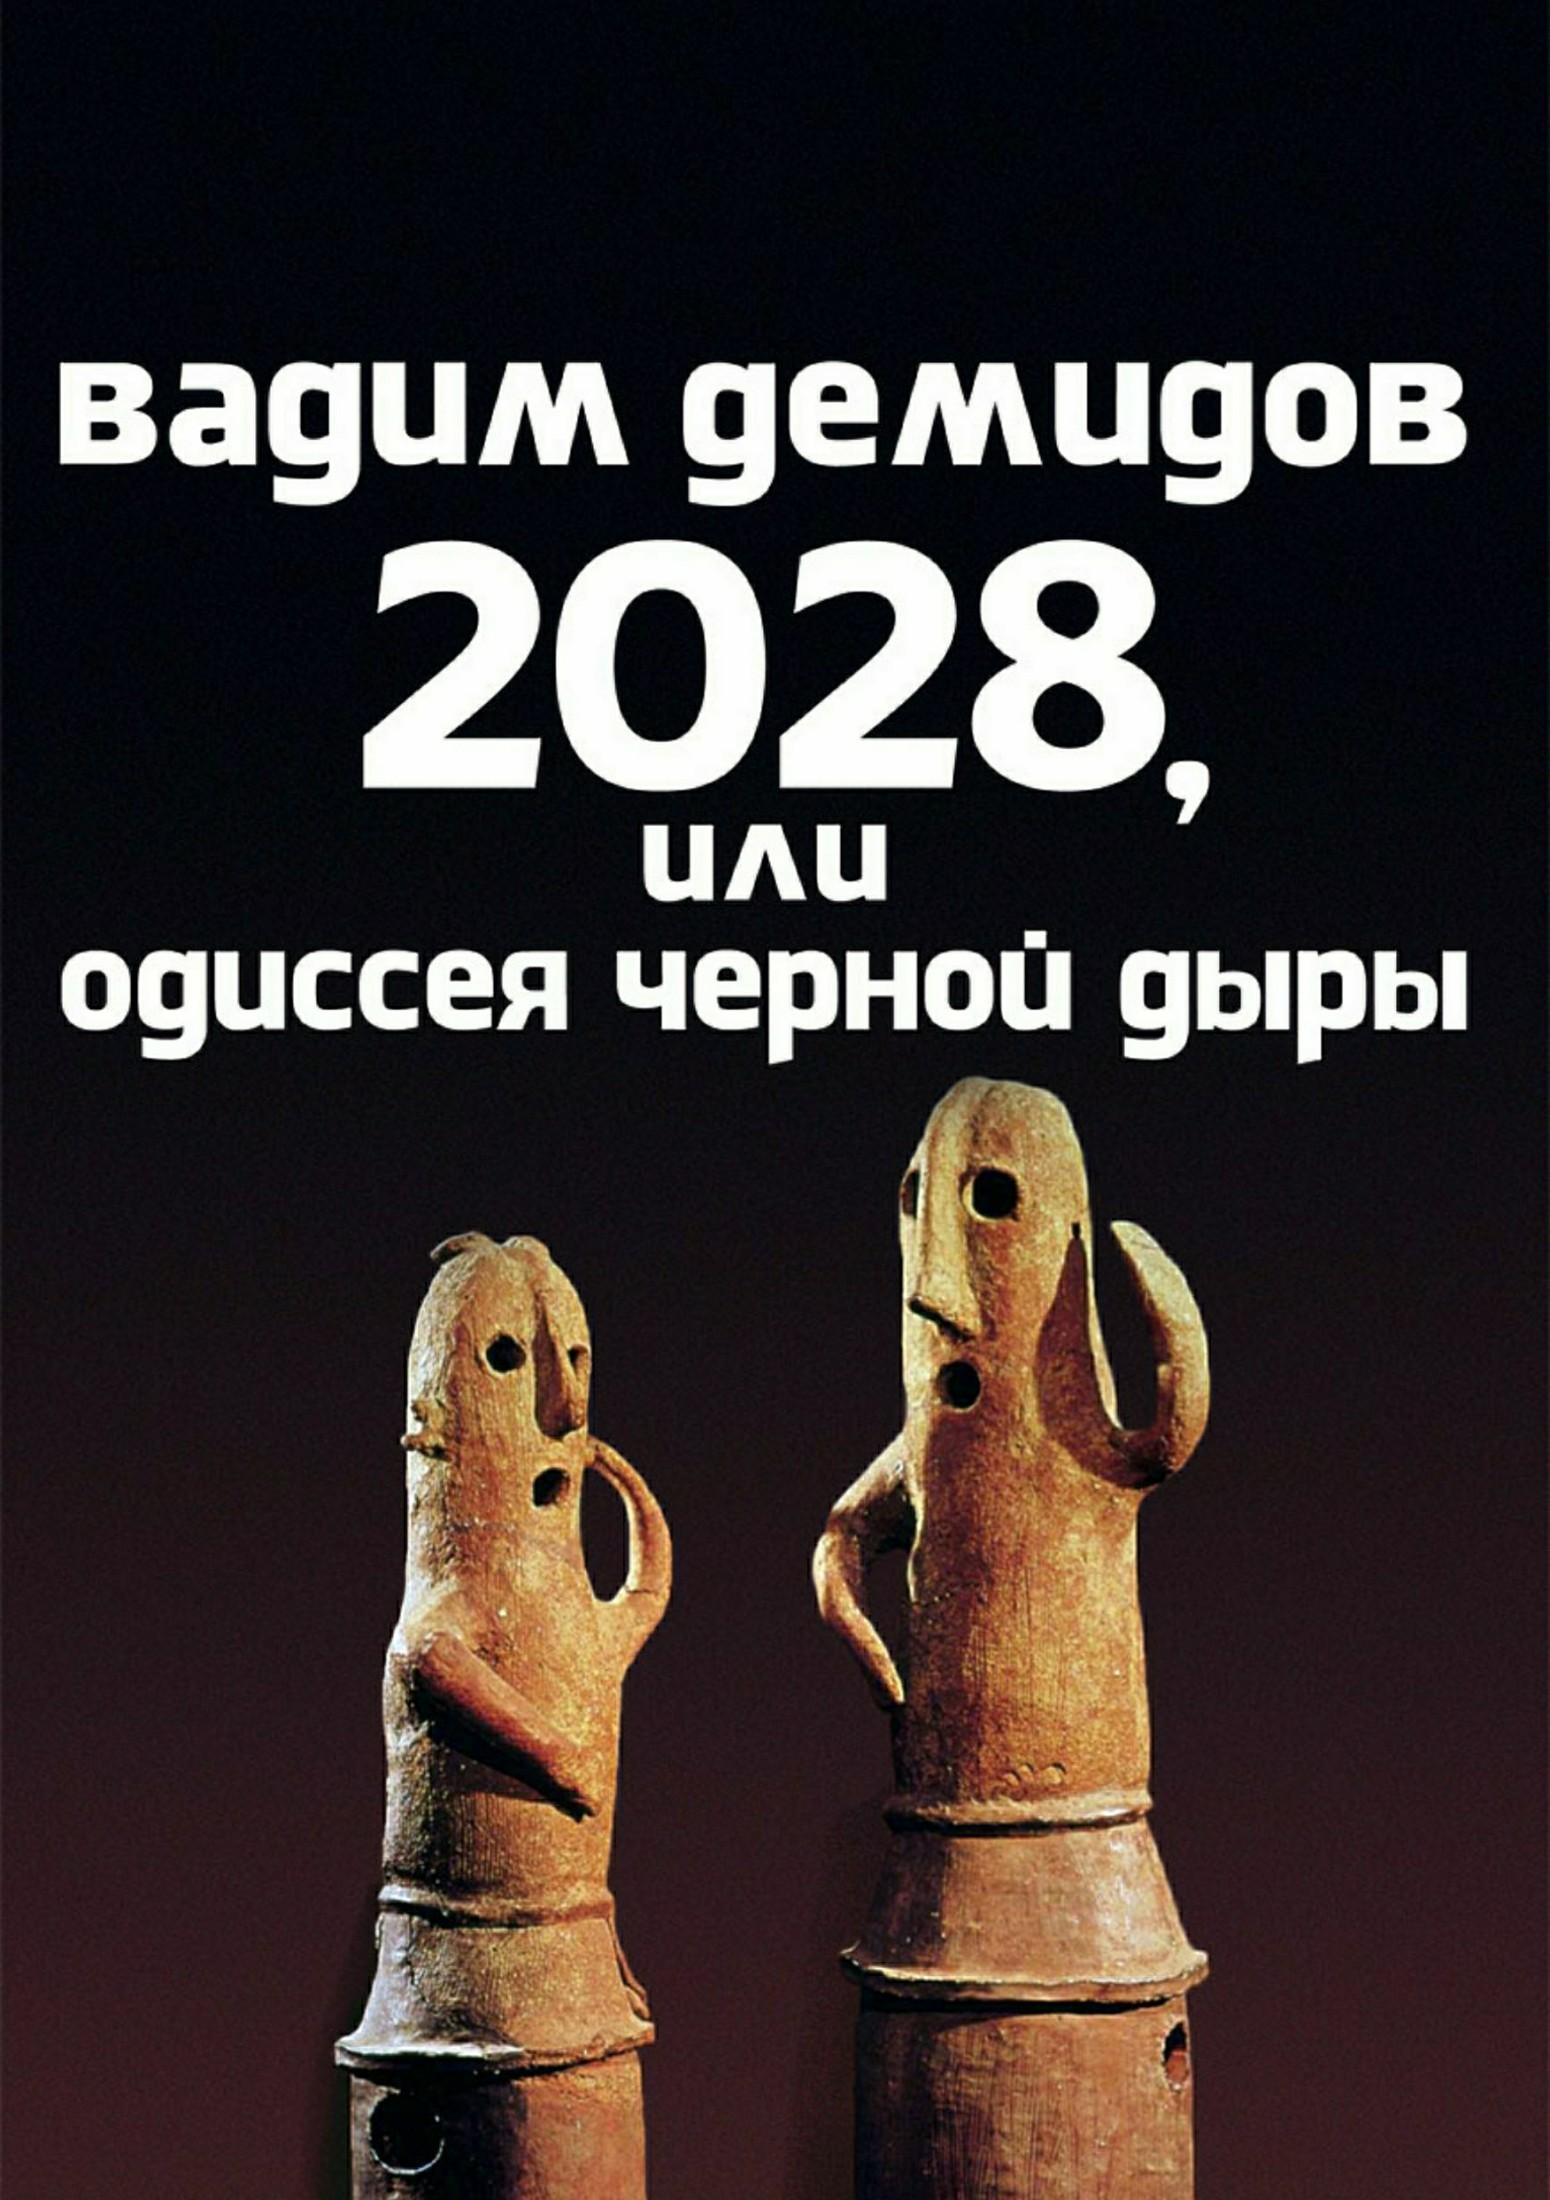 2028,